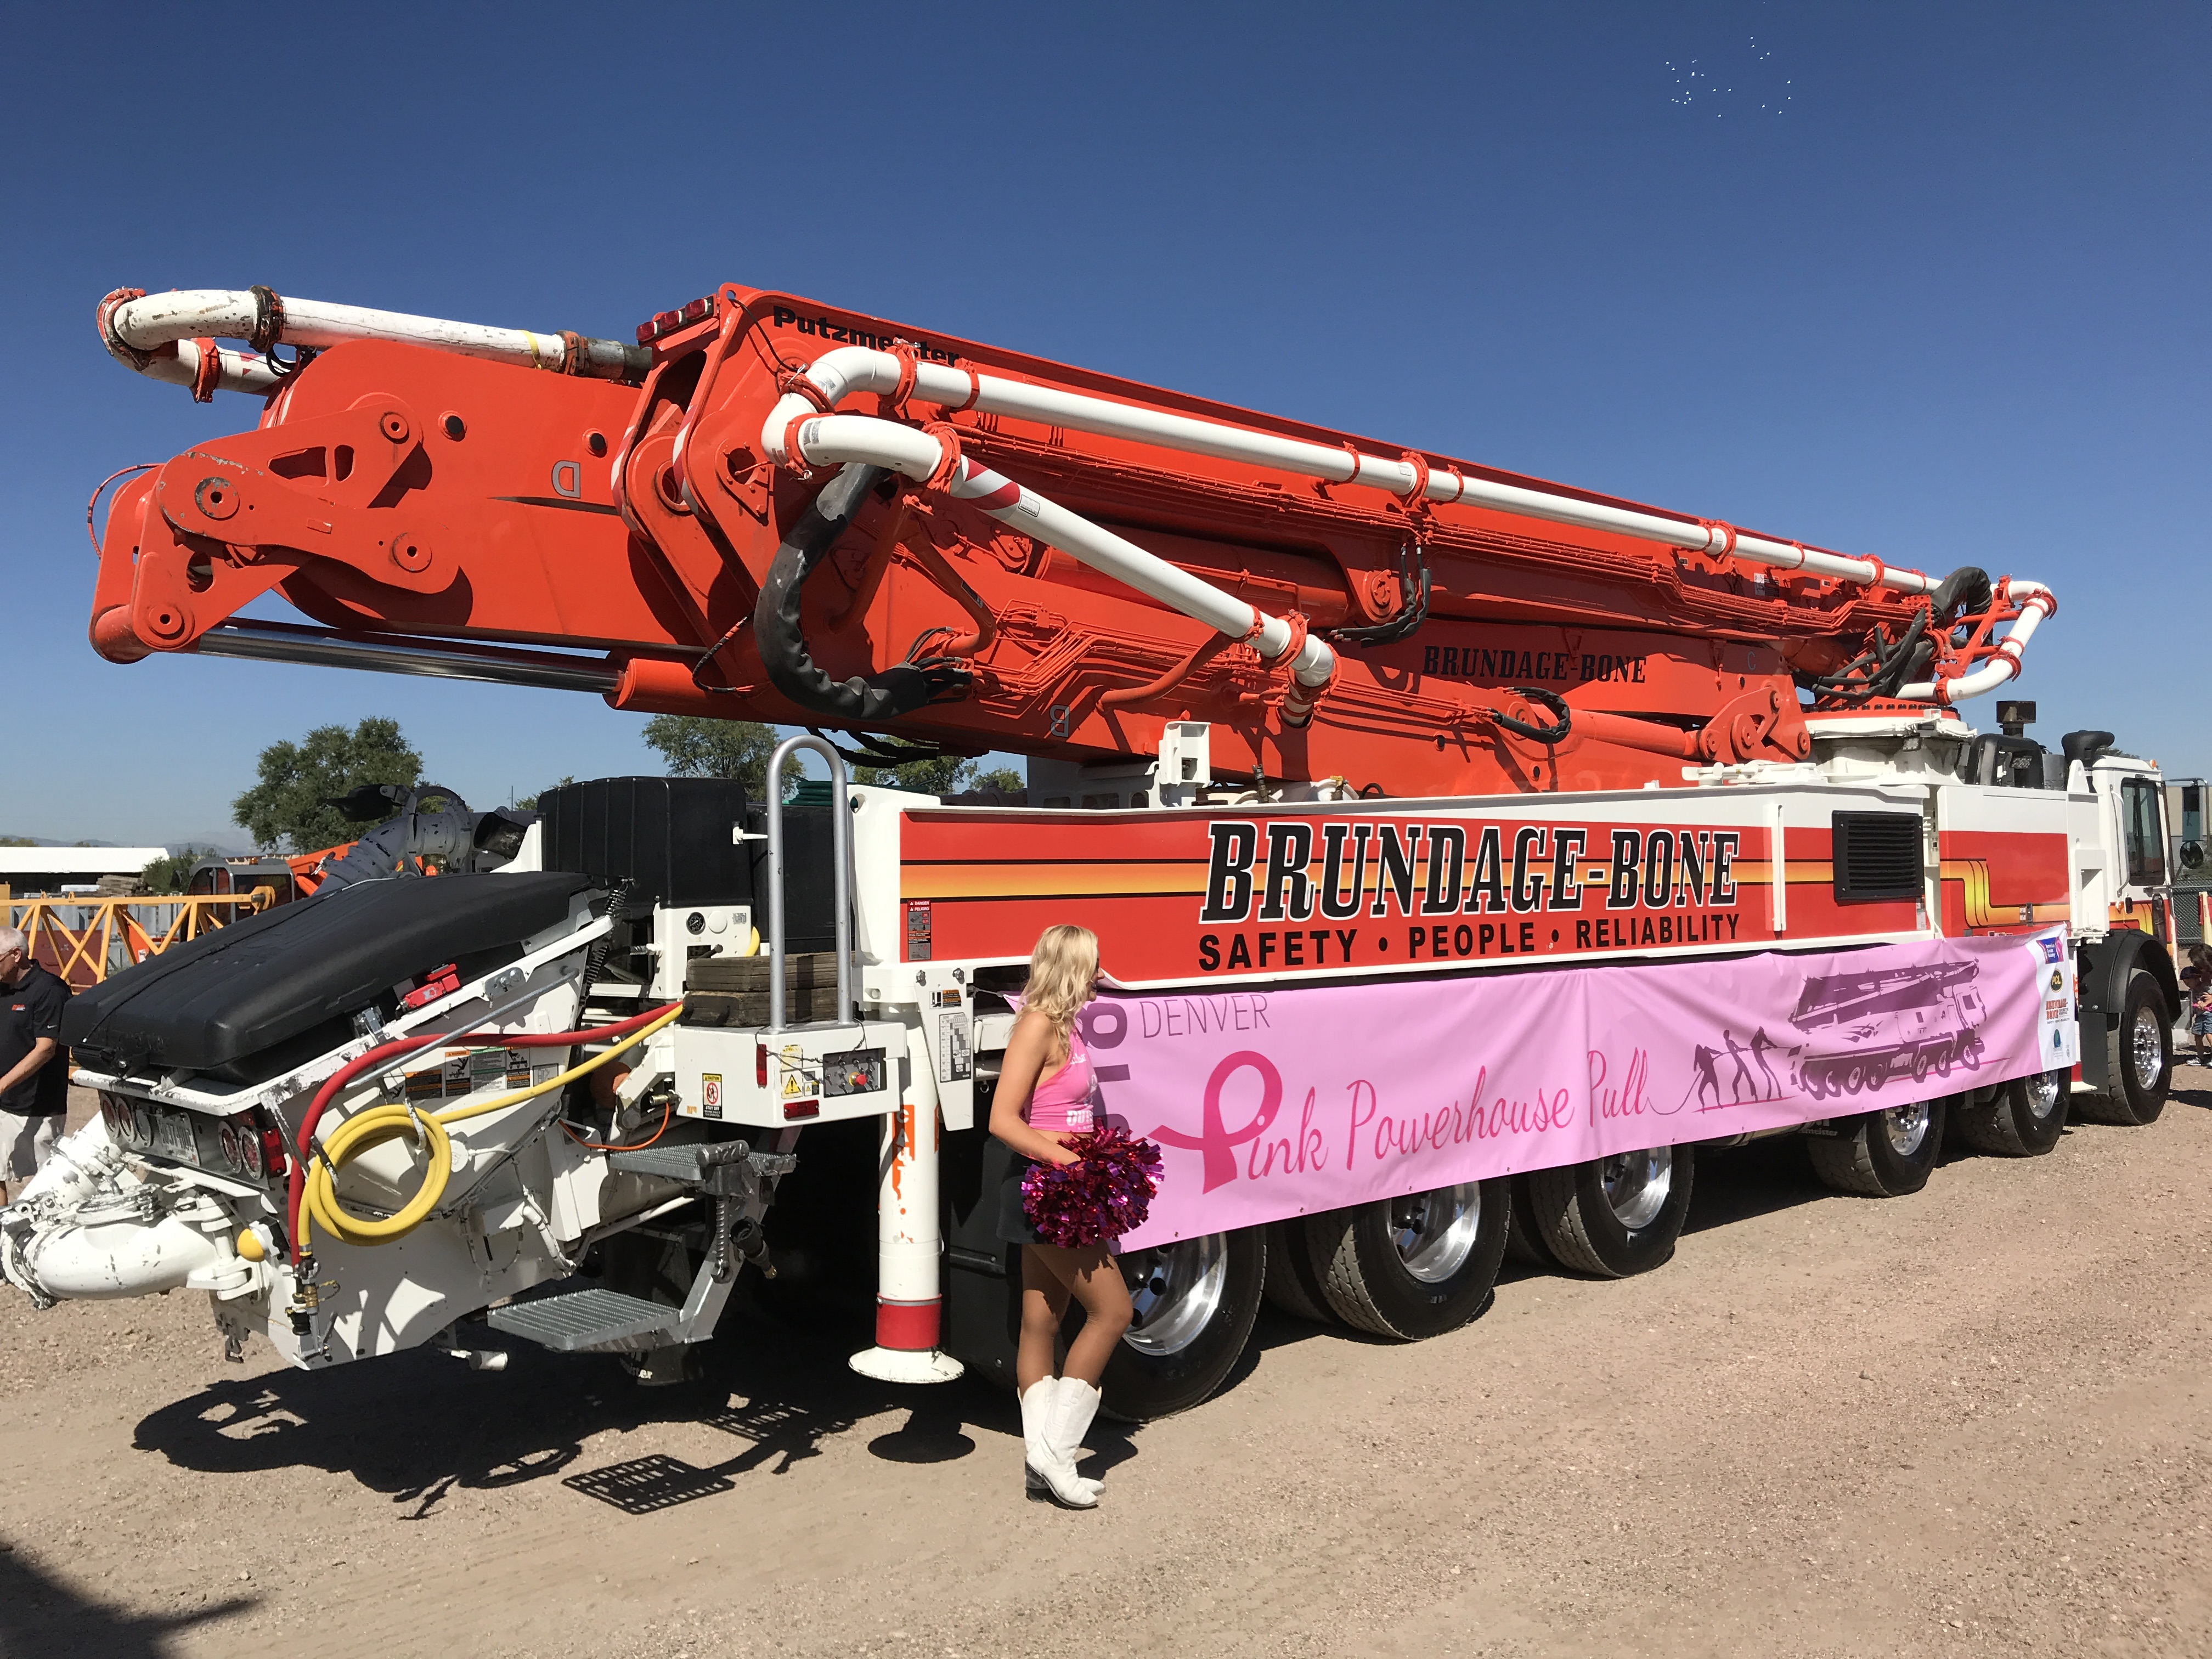 pink powerhouse contrete pull - Brundage-bone